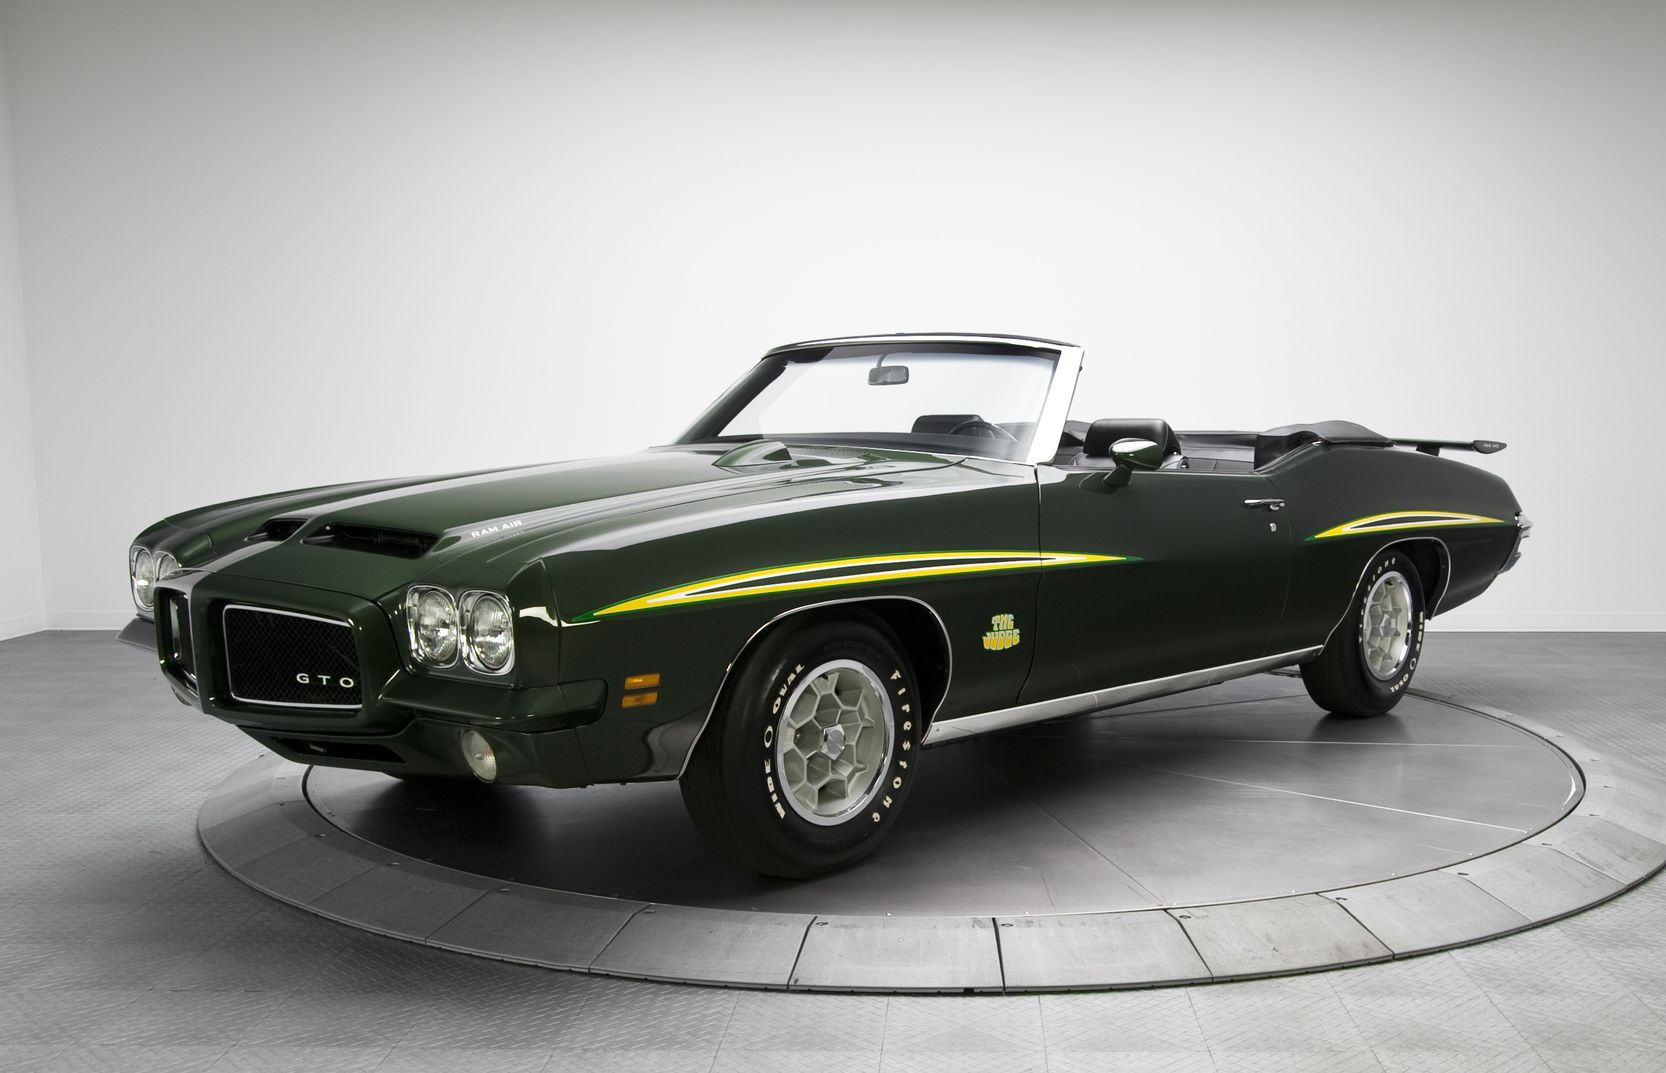 Rare American Cars - Pontiac GTO